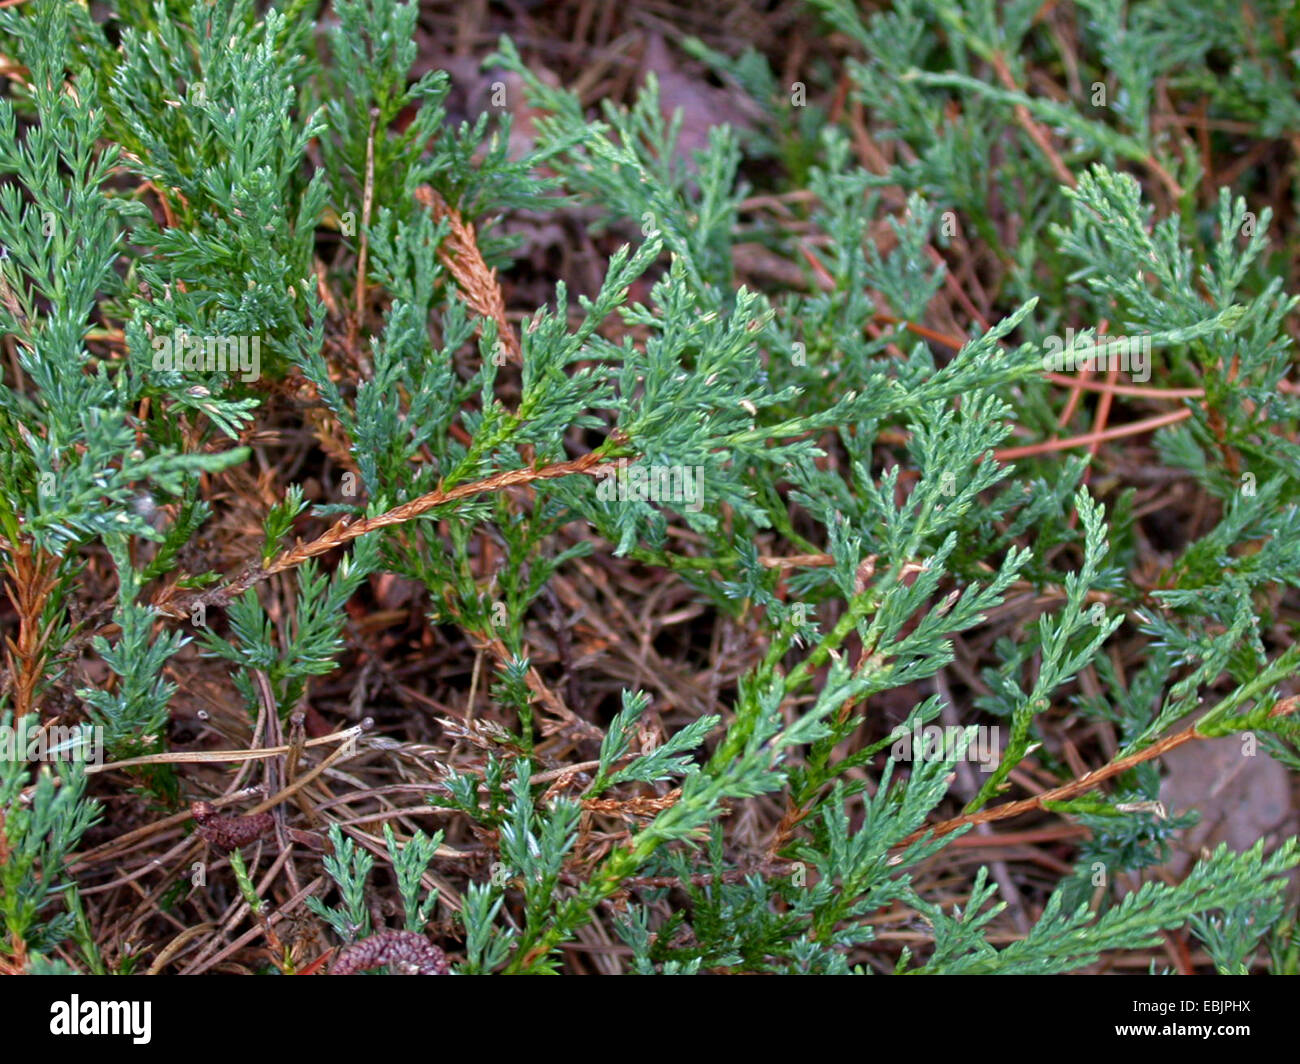 Blue rug juniper, Creeping juniper, Creeping cedar (Juniperus horizontalis), branches of wild form - Stock Image